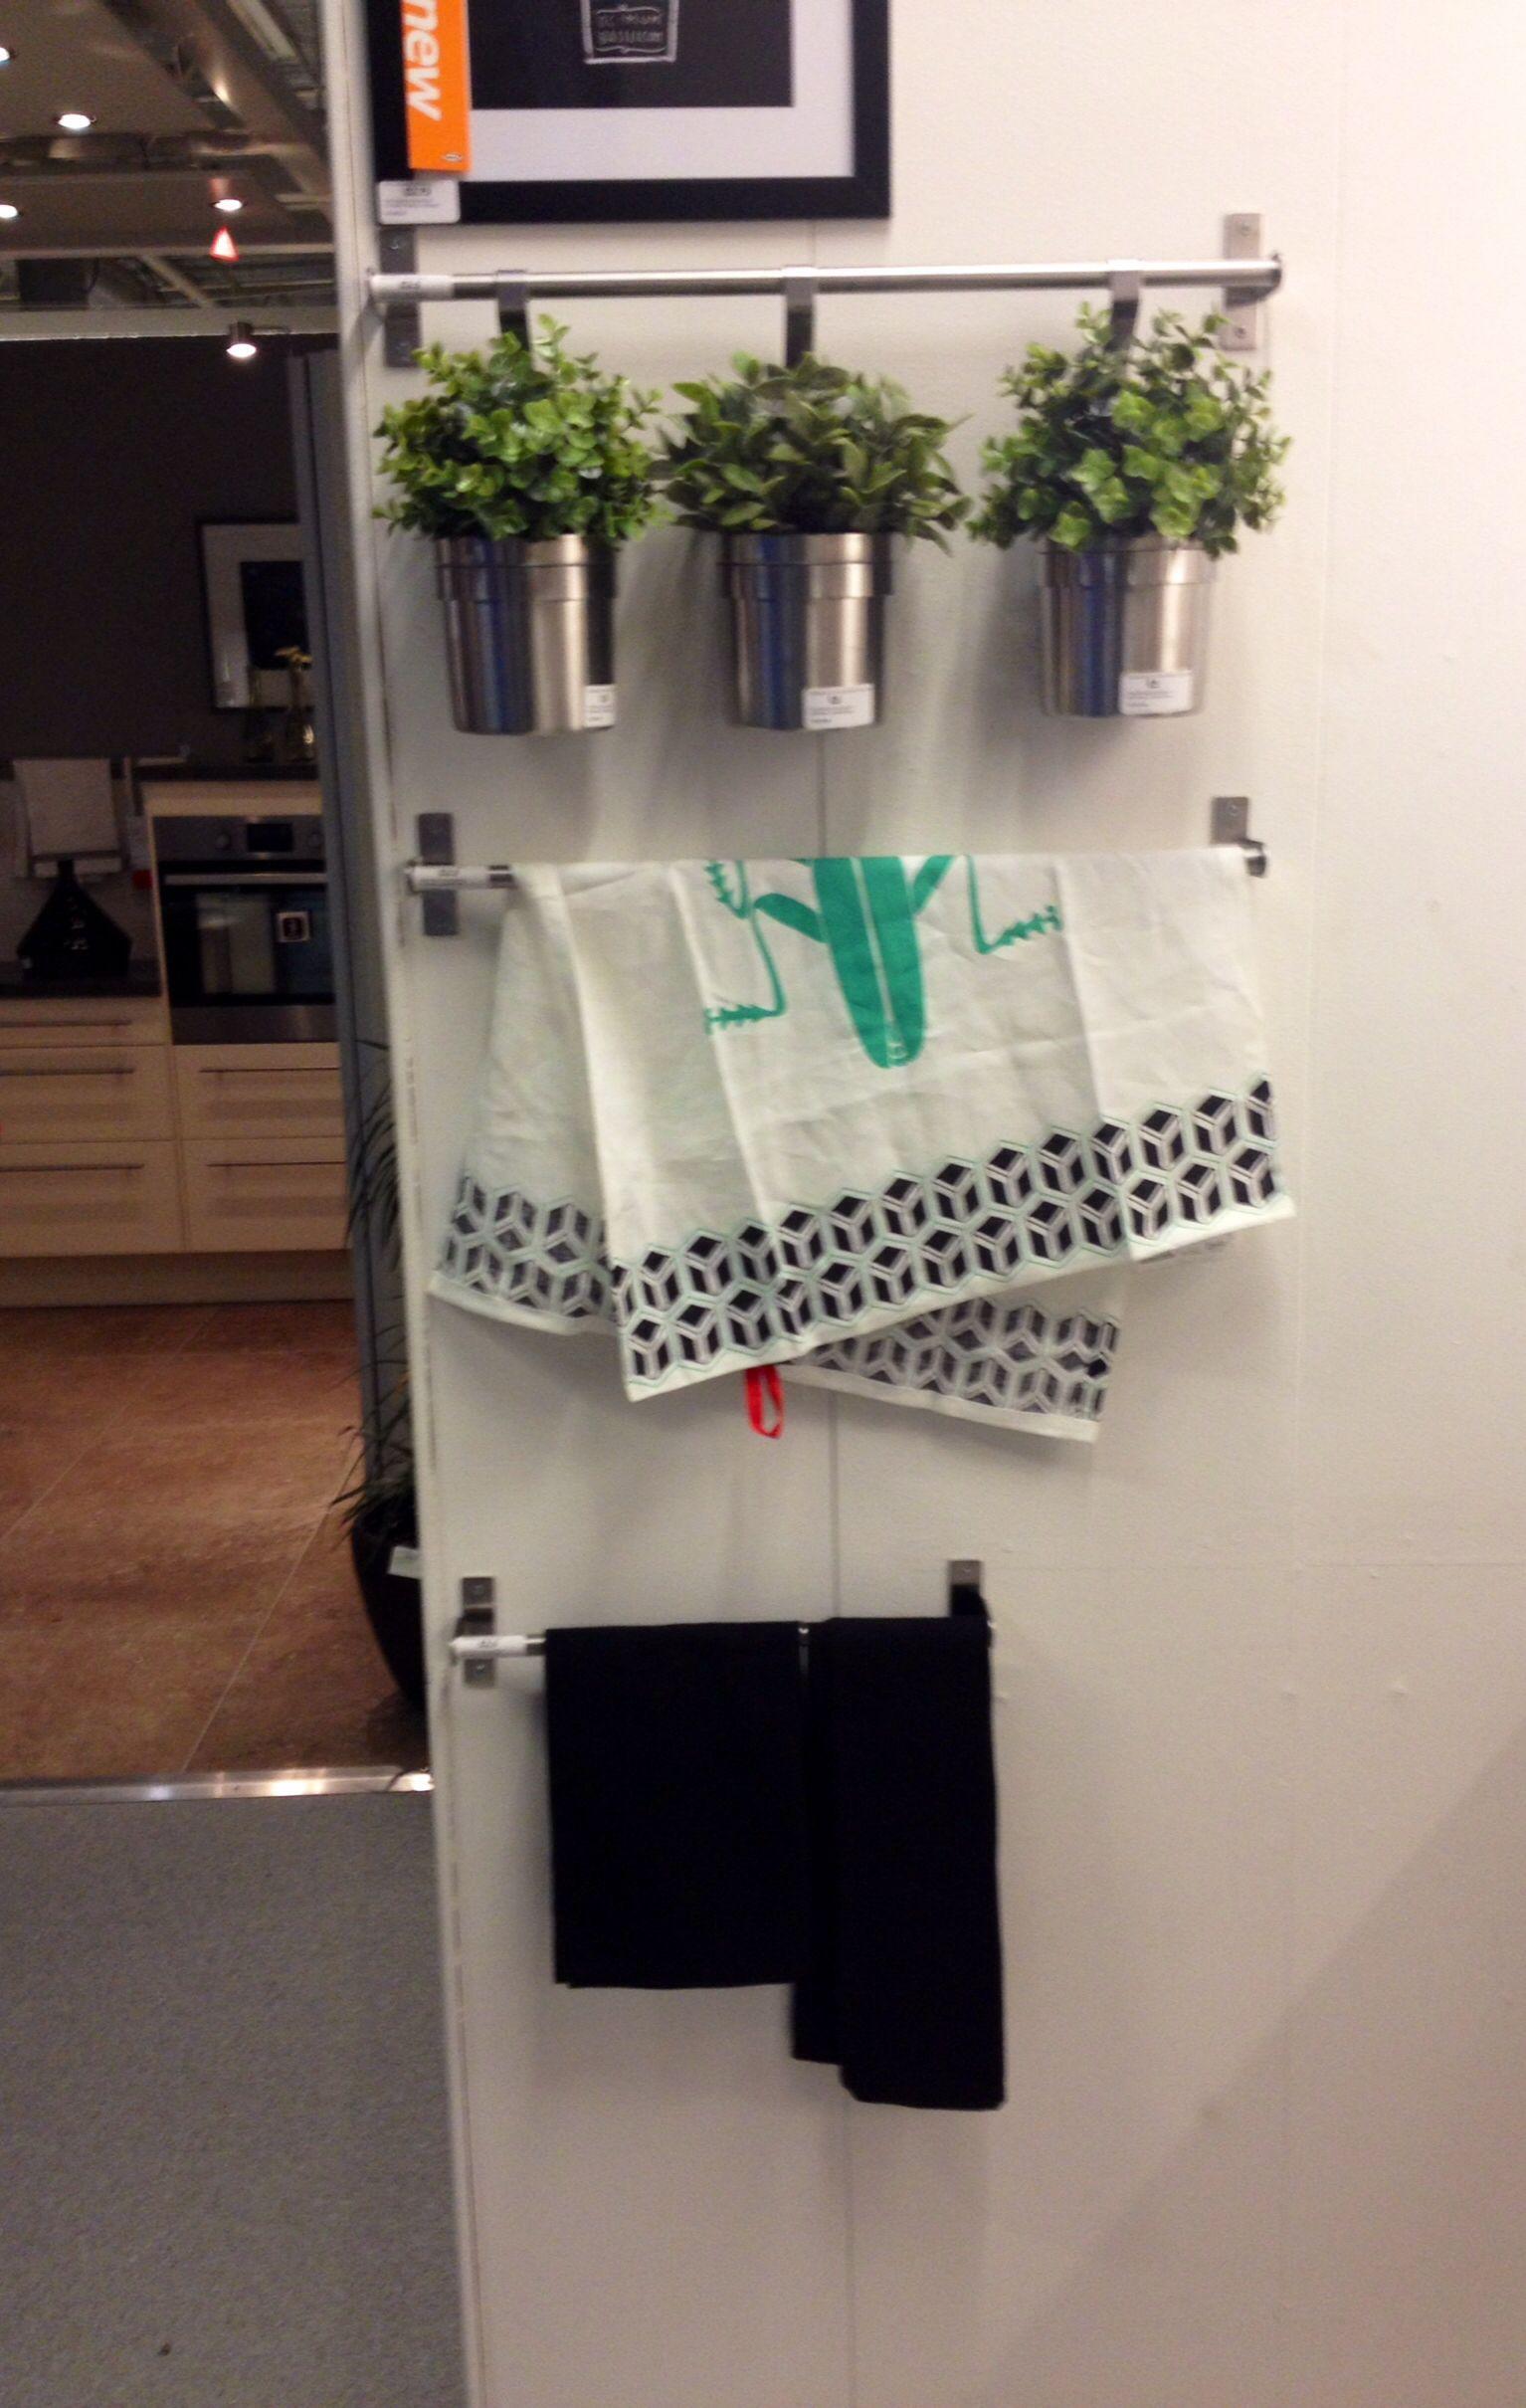 Ikea Kitchen Wall Hanging For Utensils Good Idea For A Small Kitchen Kitchen Wall Hangings Ikea Kitchen